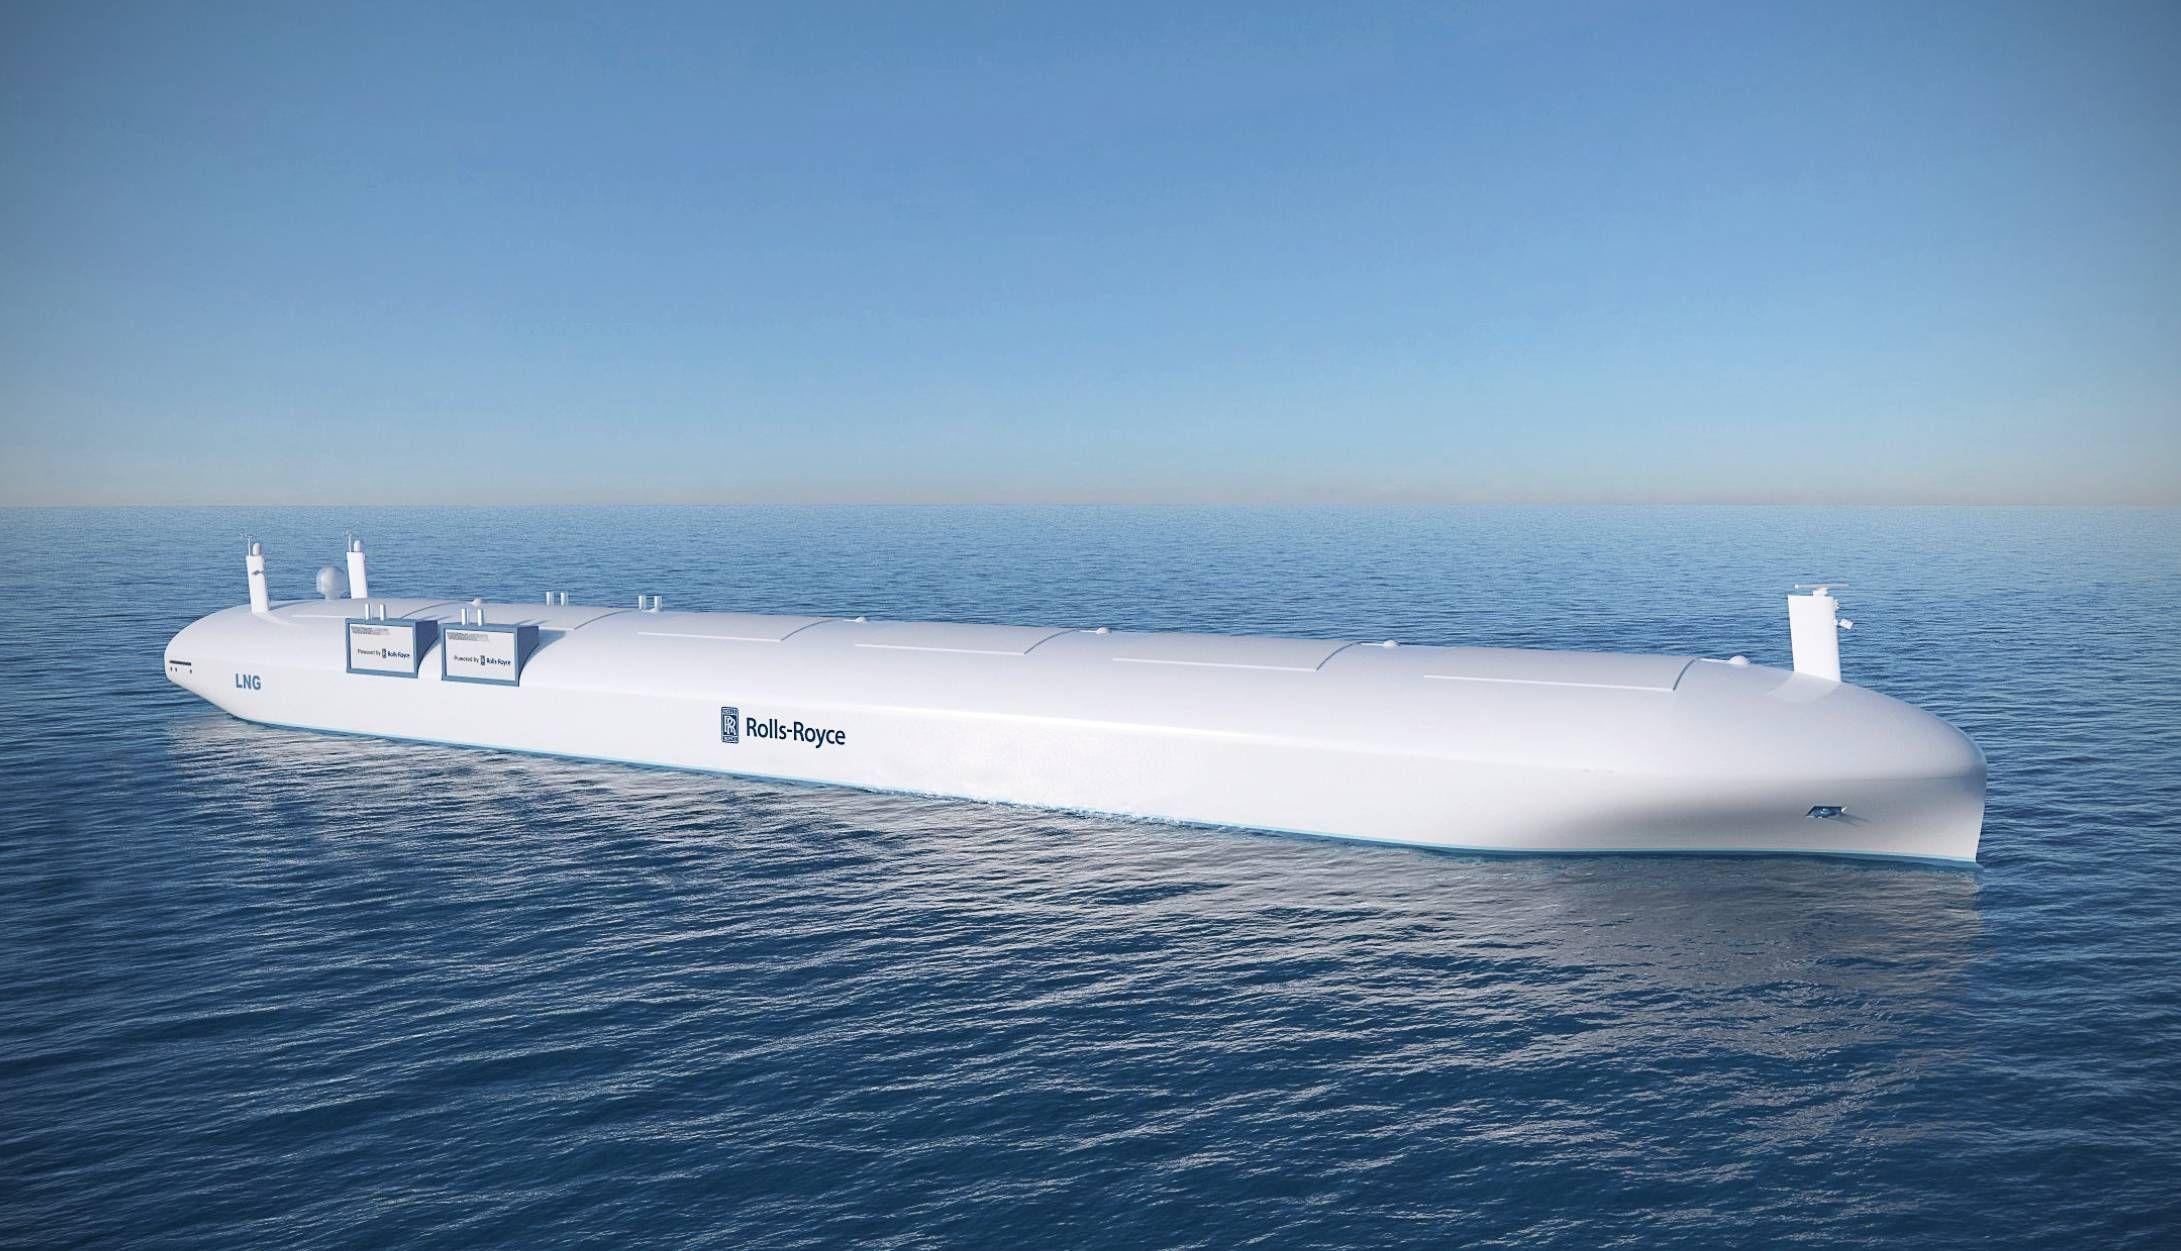 Rolls Royce Plans Self Driving Cargo Ships